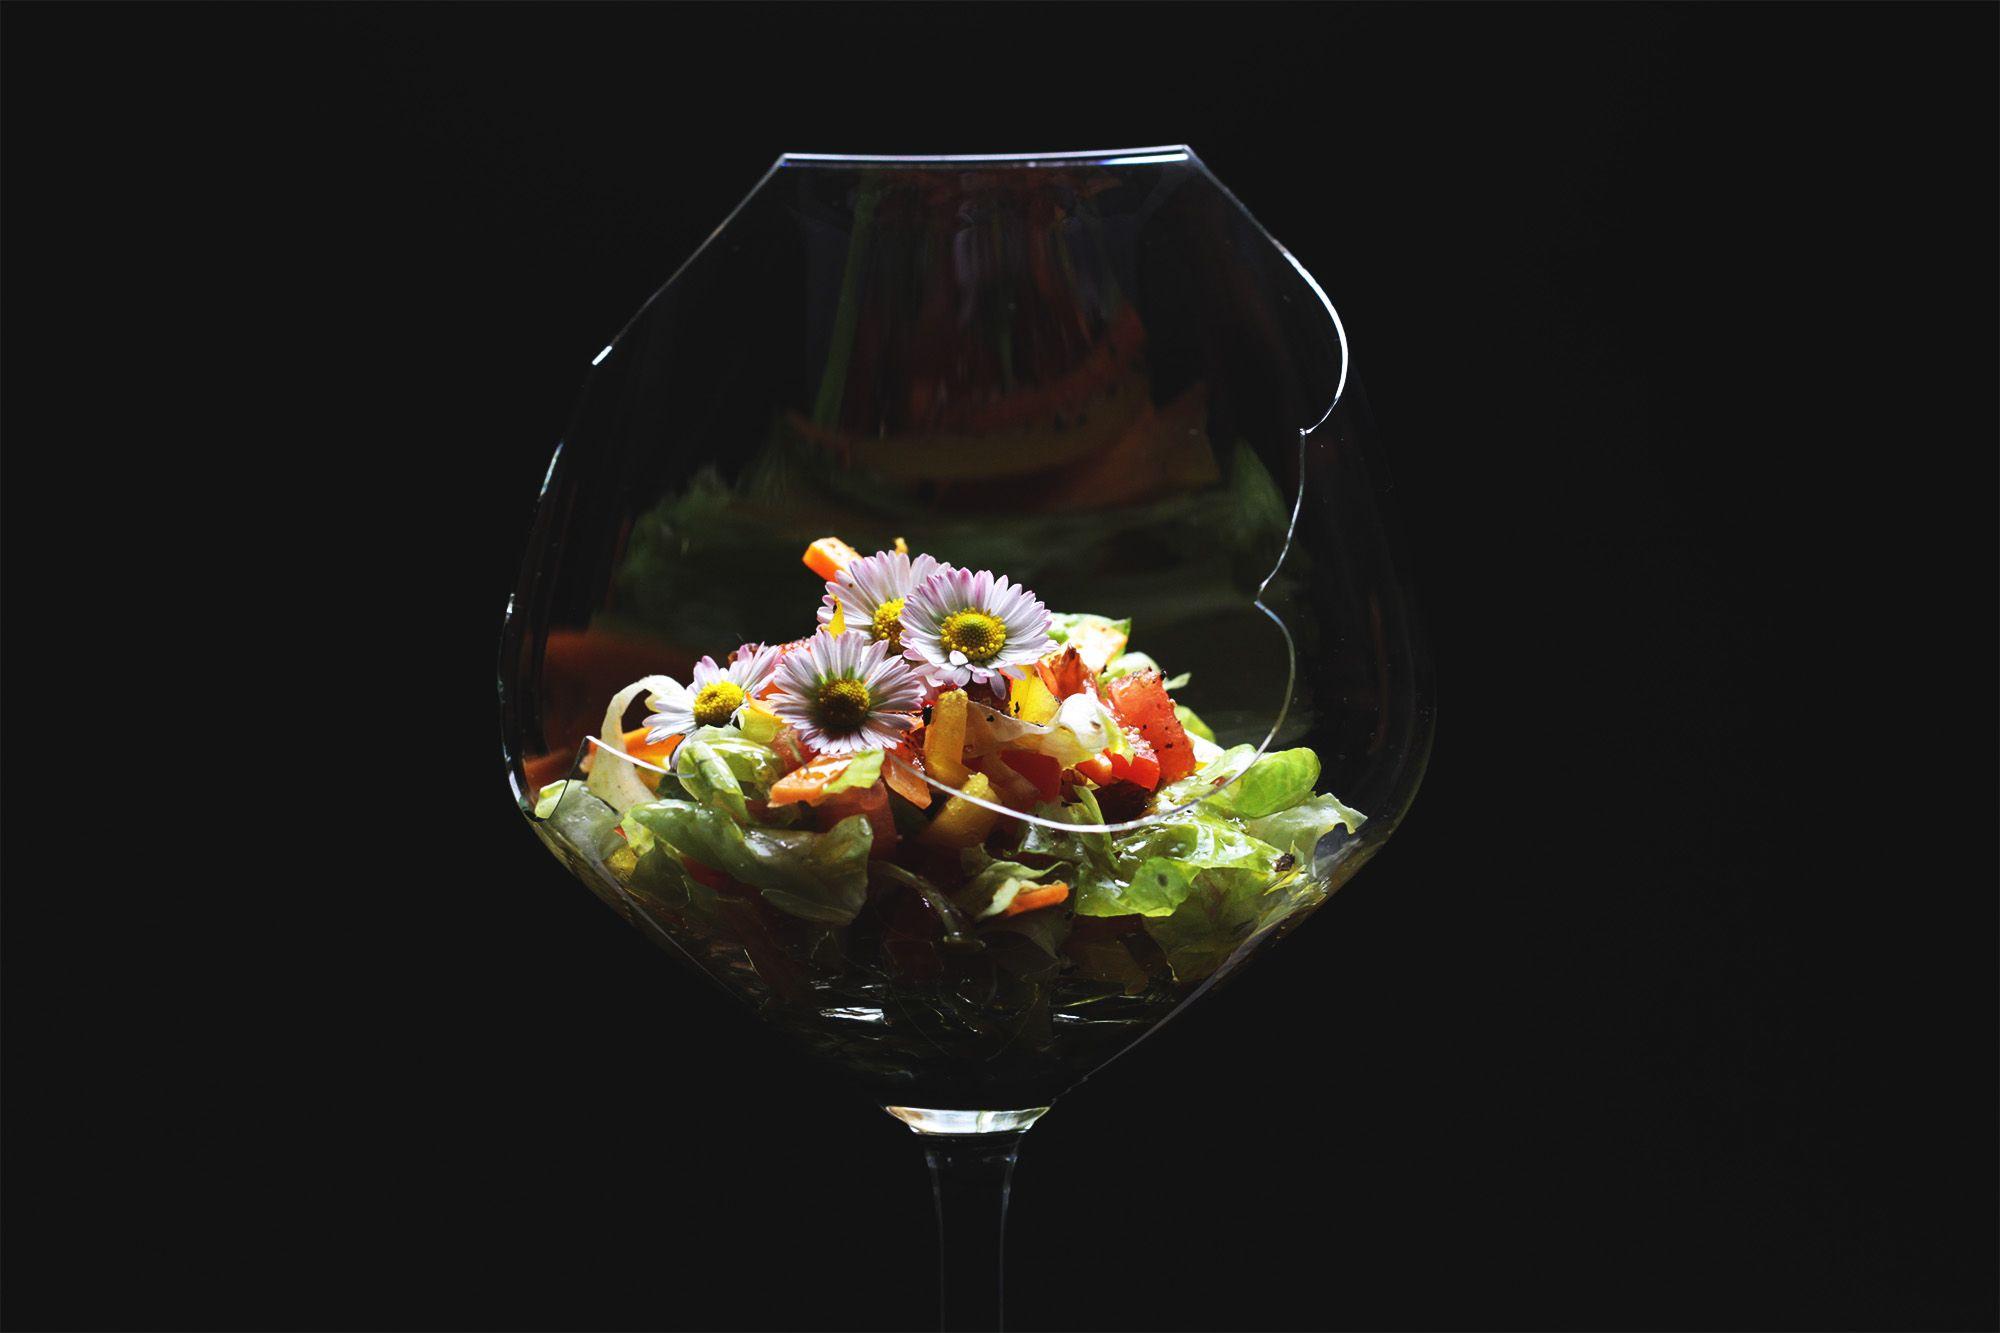 creative_salad_designing_reality